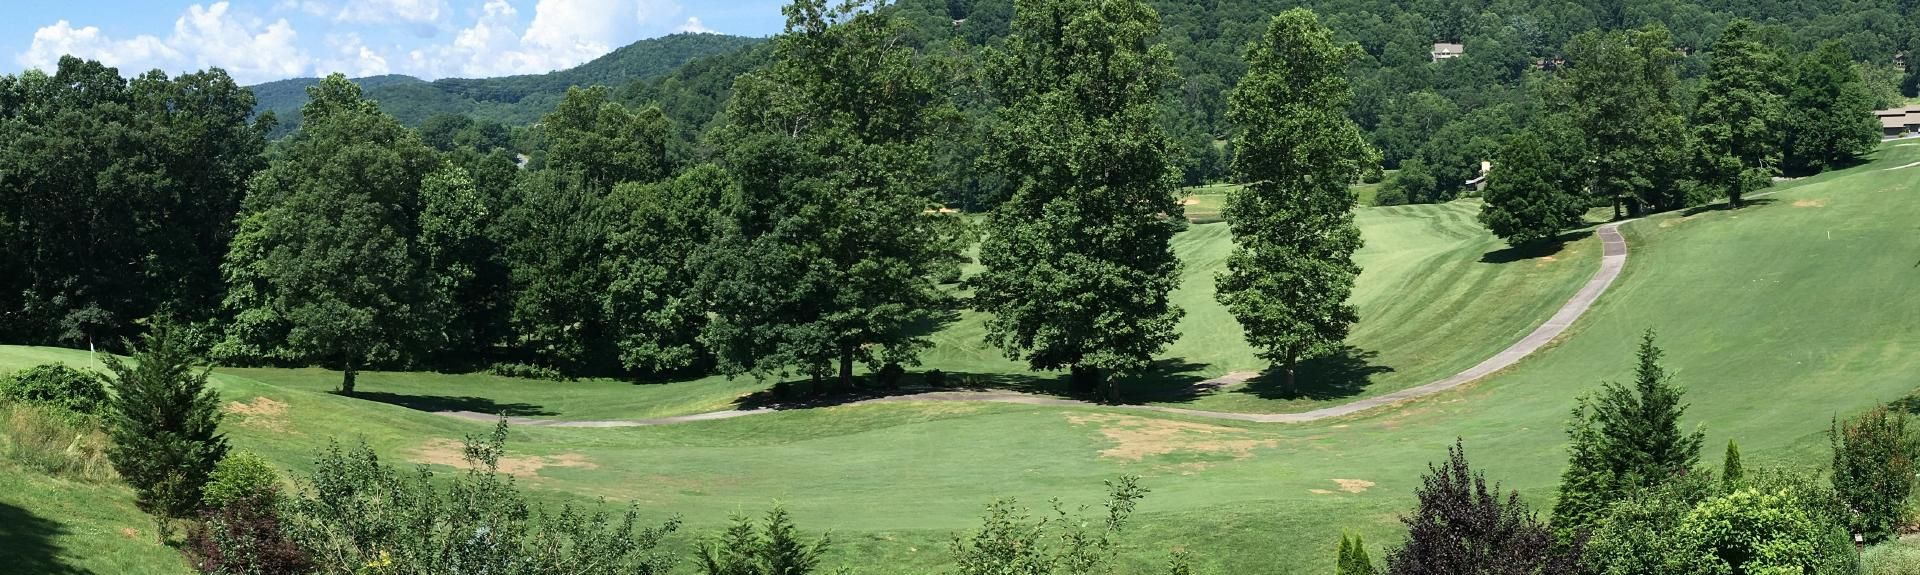 North Carolina Arboretum, Asheville, North Carolina, United States of America